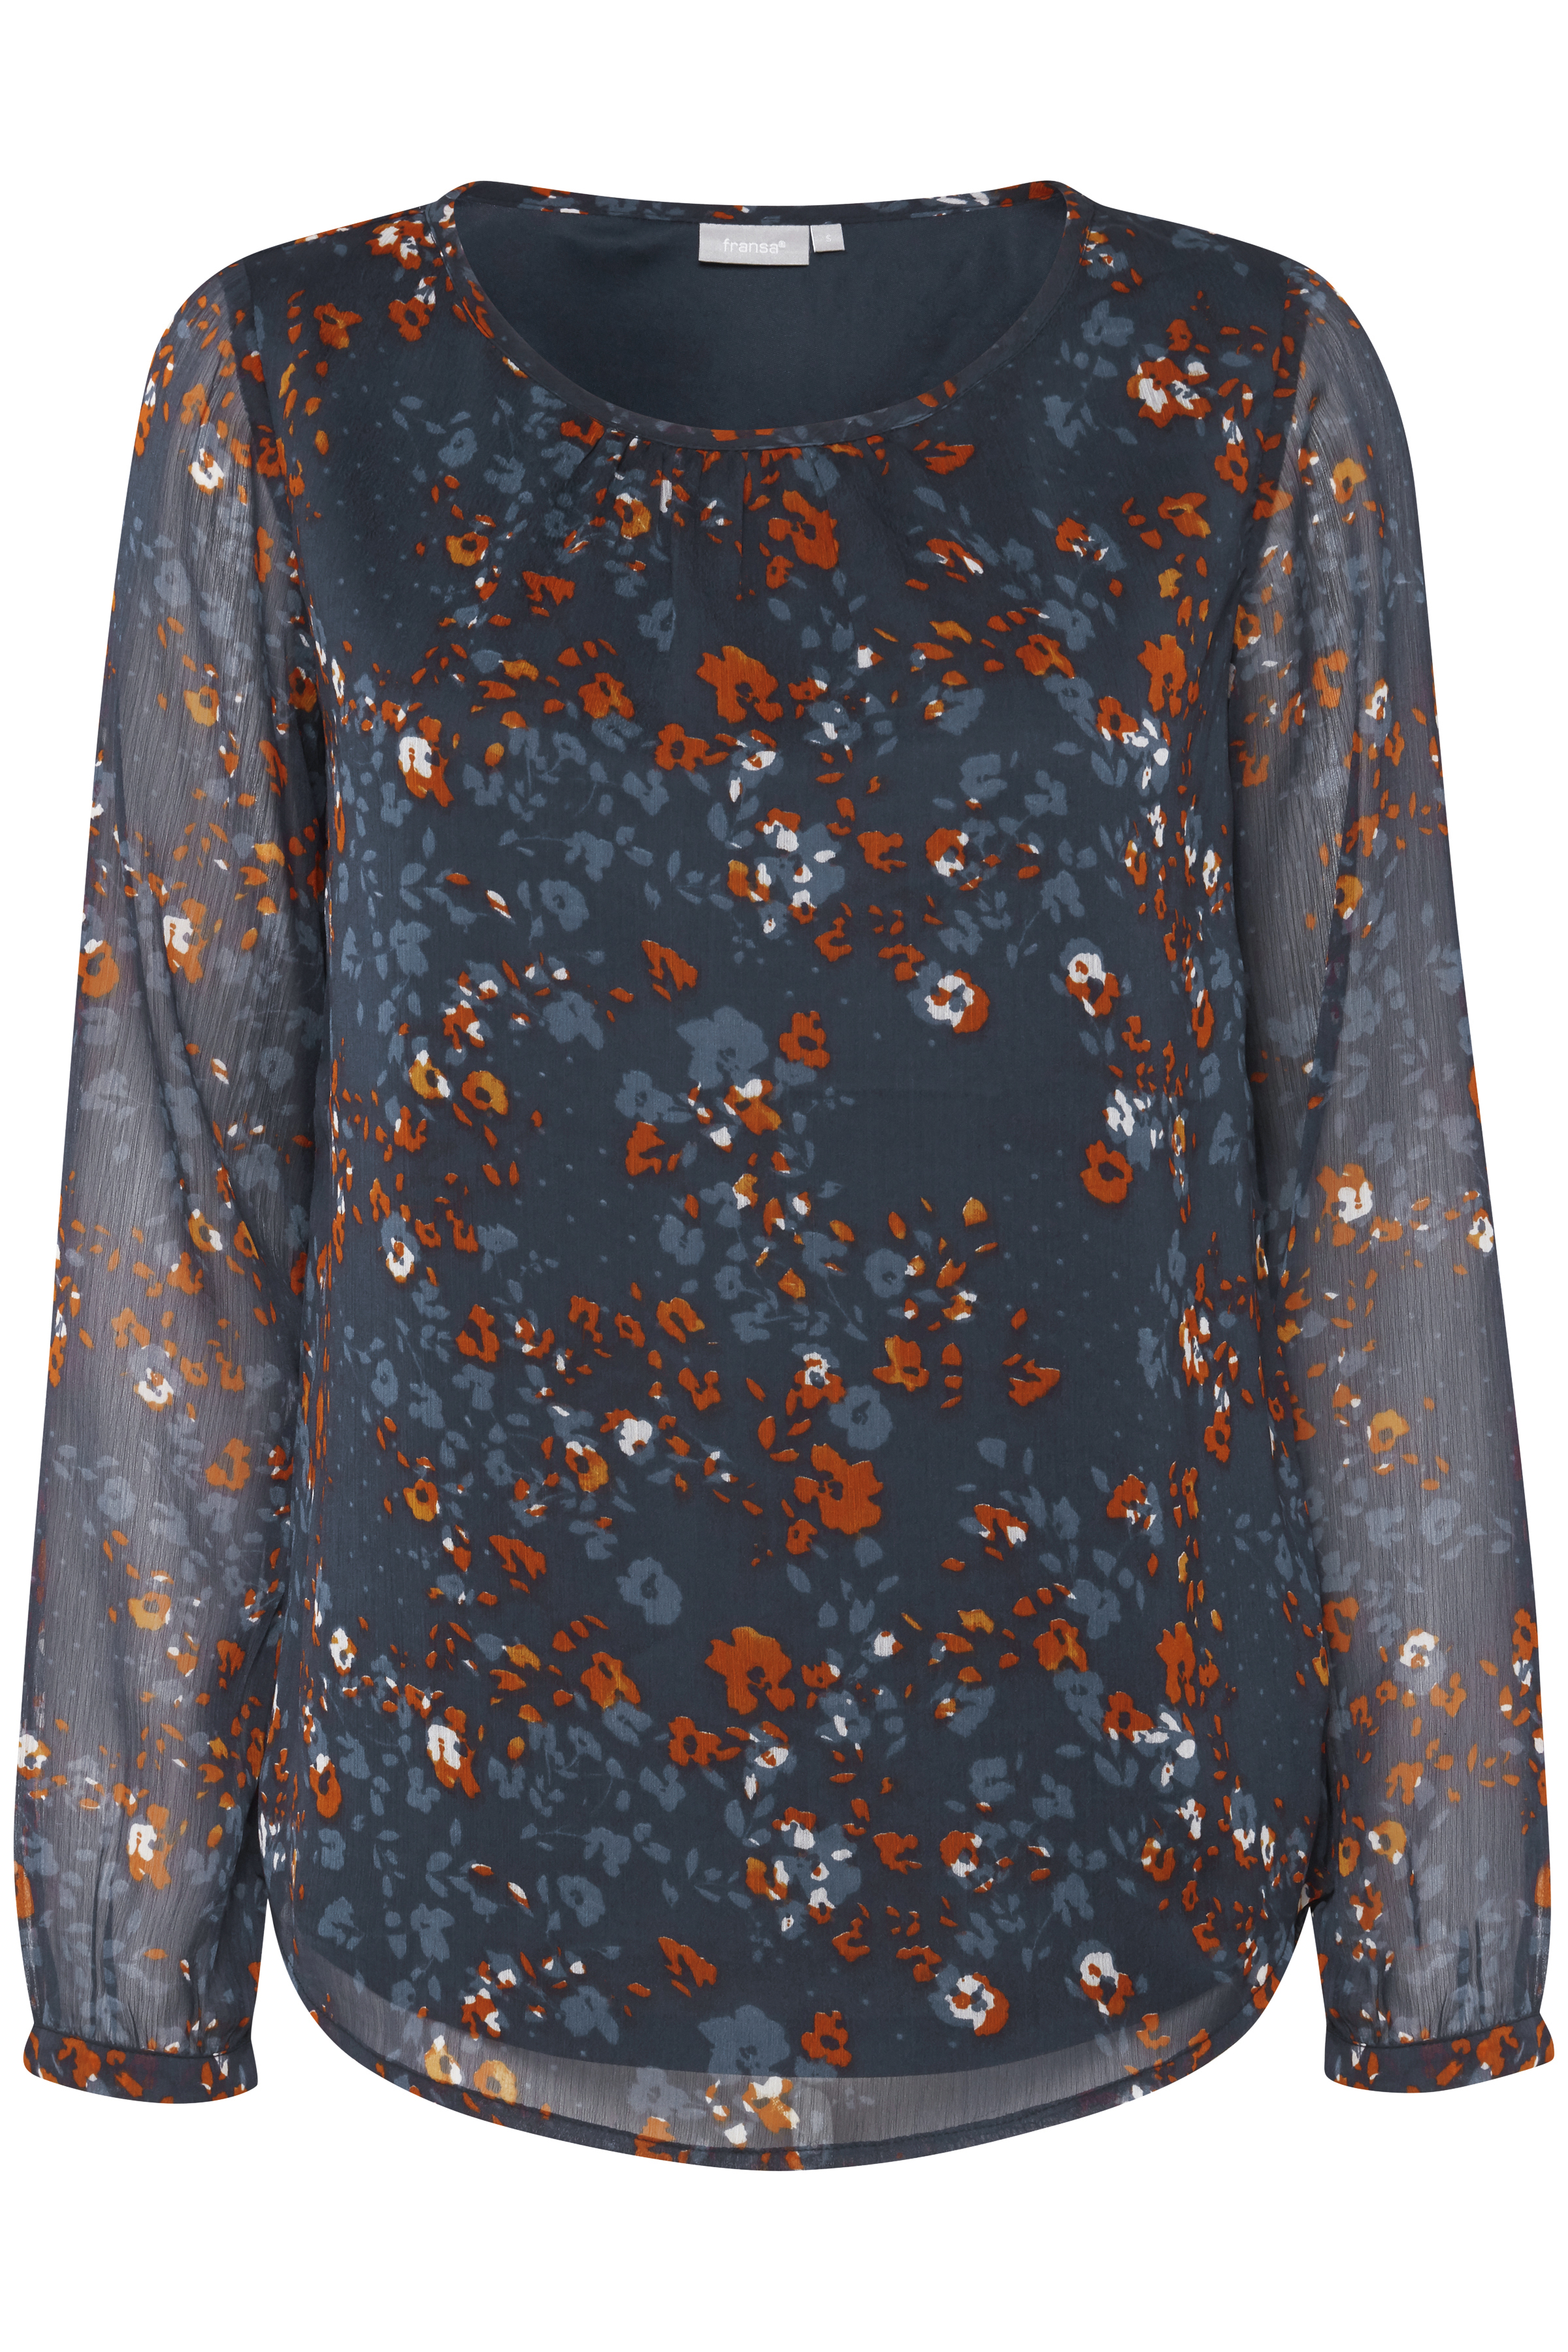 Marineblau/gebranntes rot Langarm-Bluse von Fransa – Shoppen Sie Marineblau/gebranntes rot Langarm-Bluse ab Gr. XS-XXL hier